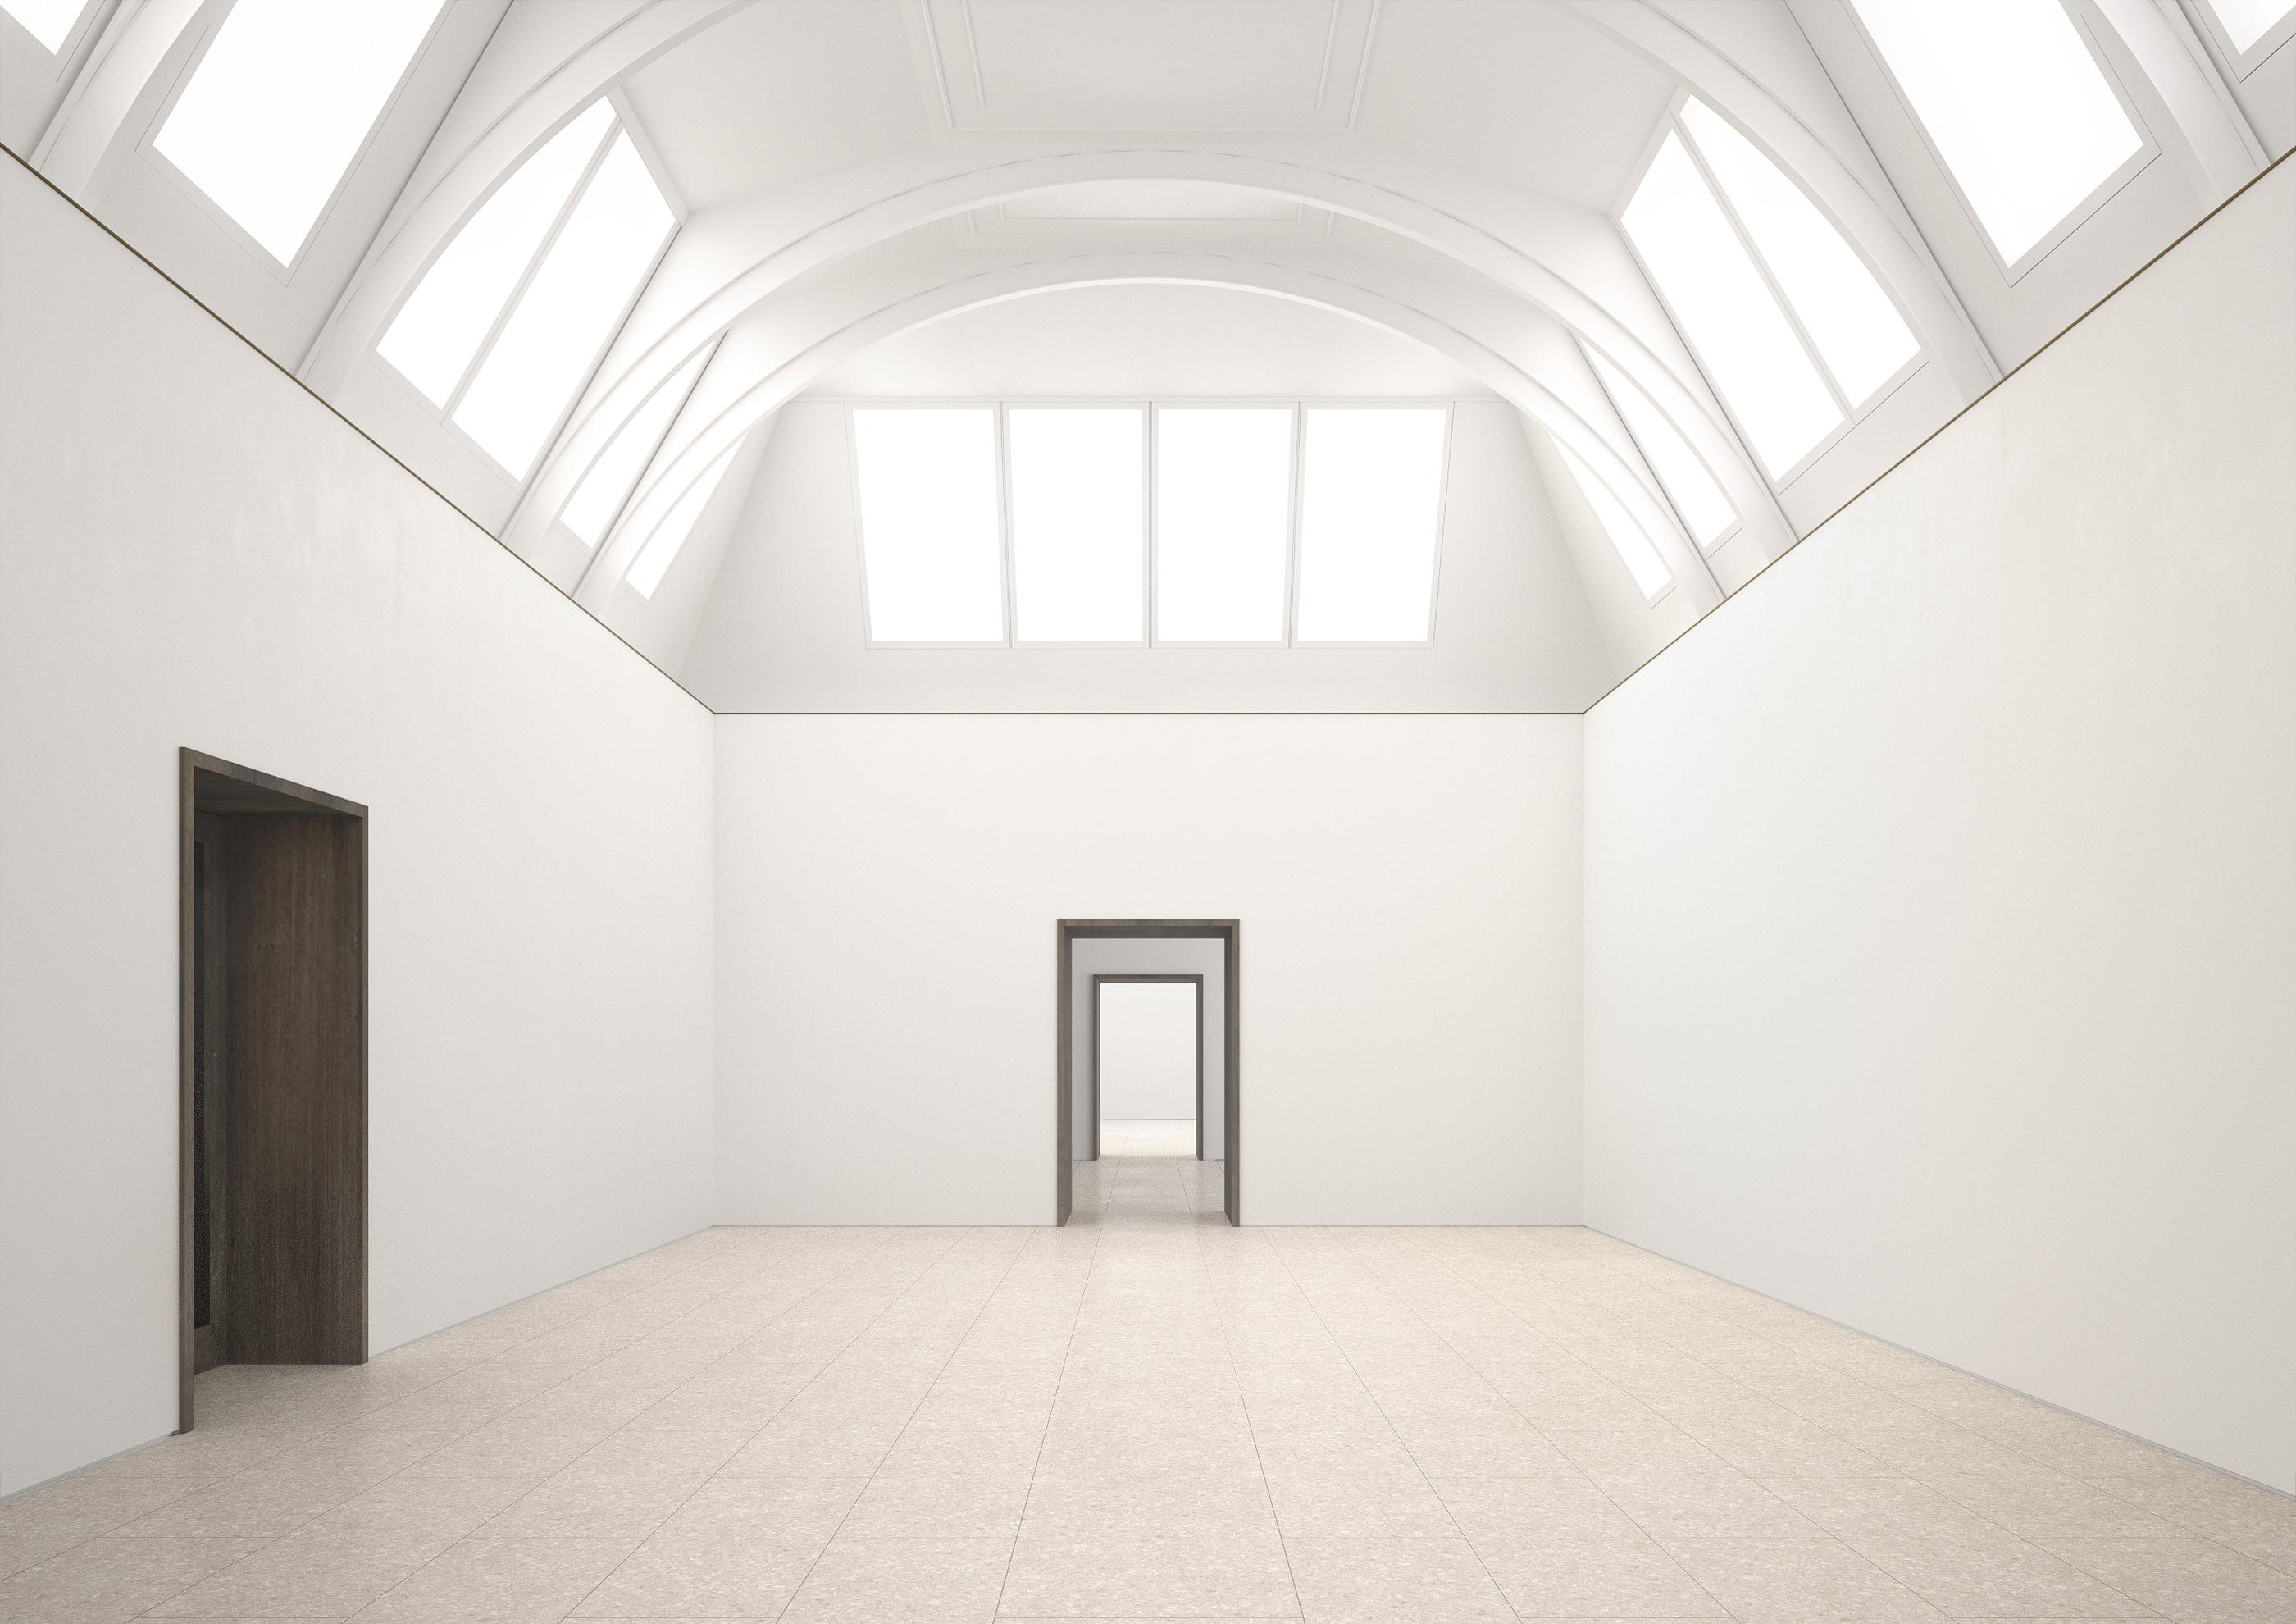 New Royal Academy - Burlington Gardens Galleries